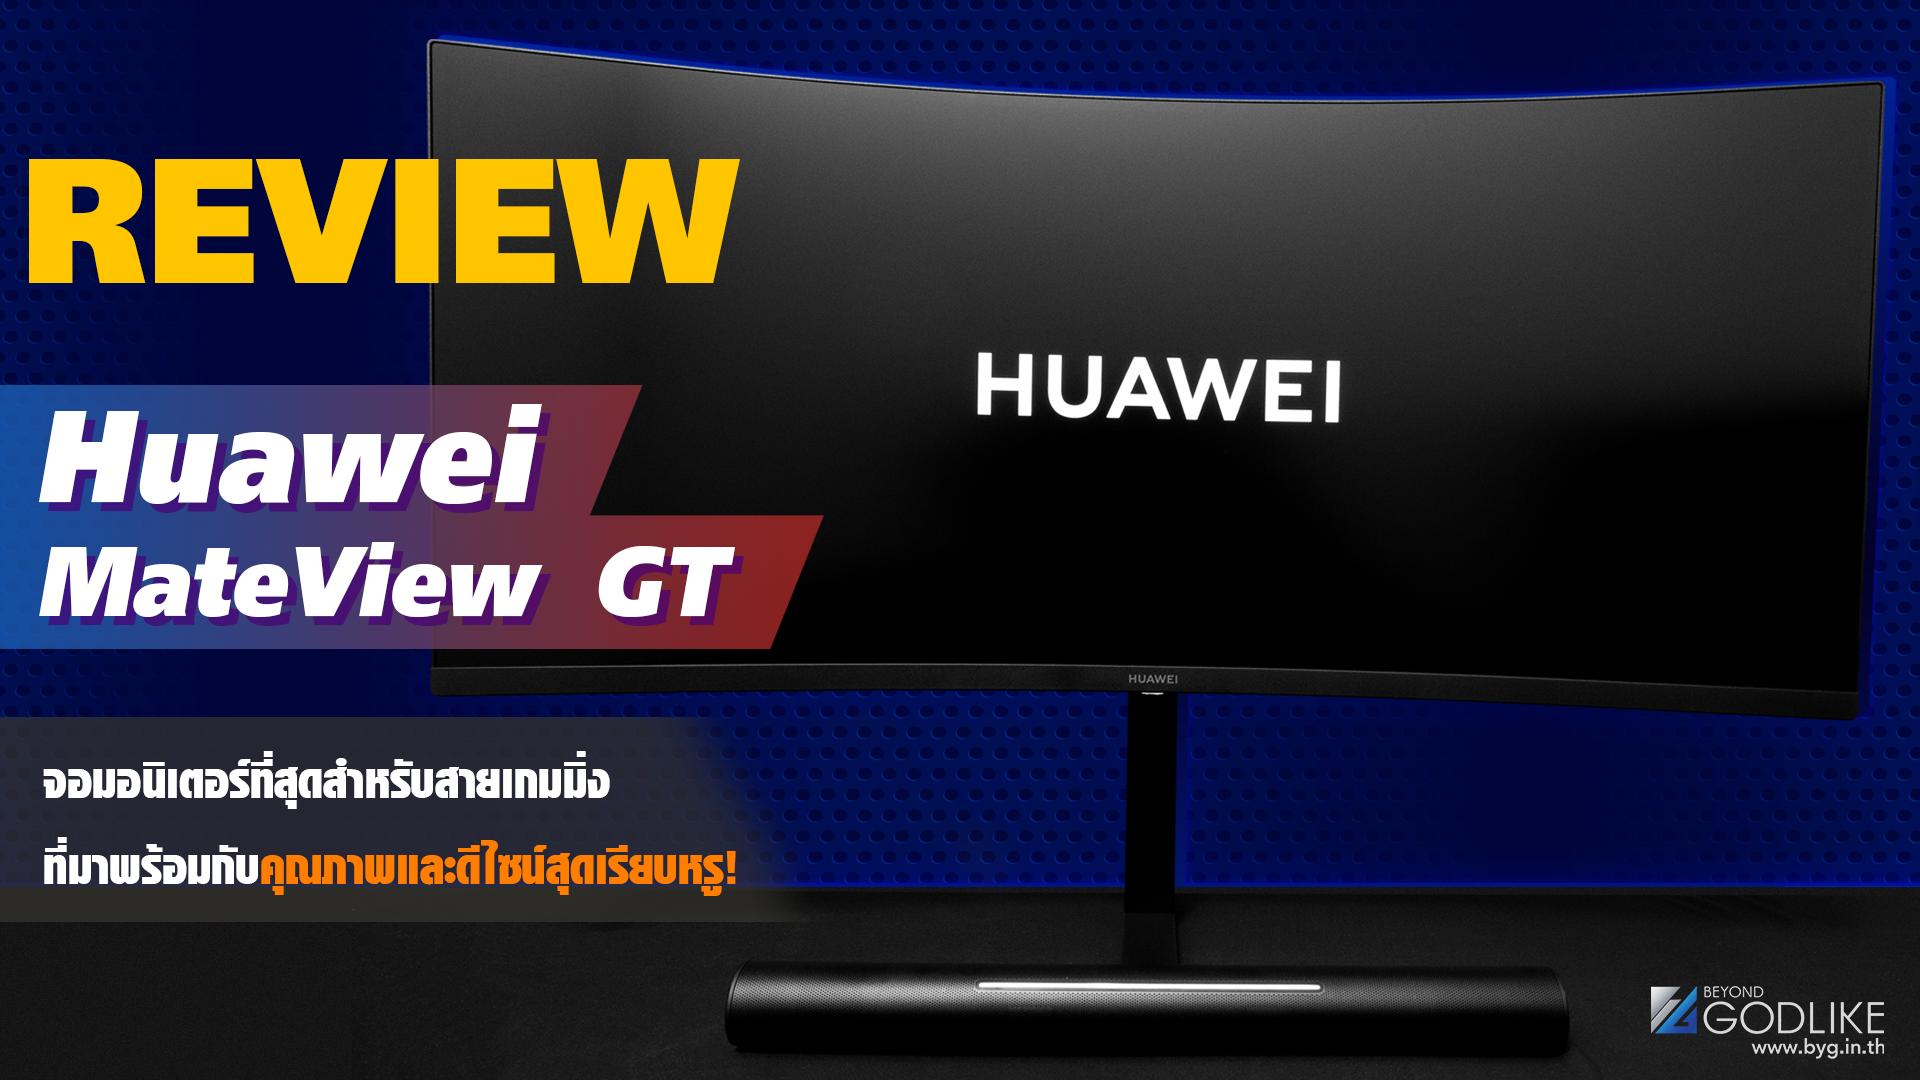 [Review] Huawei MateView GT จอมอนิเตอร์ที่สุดสำหรับสายเกมมิ่งที่มาพร้อมกับคุณภาพและดีไซน์สุดเรียบหรู!